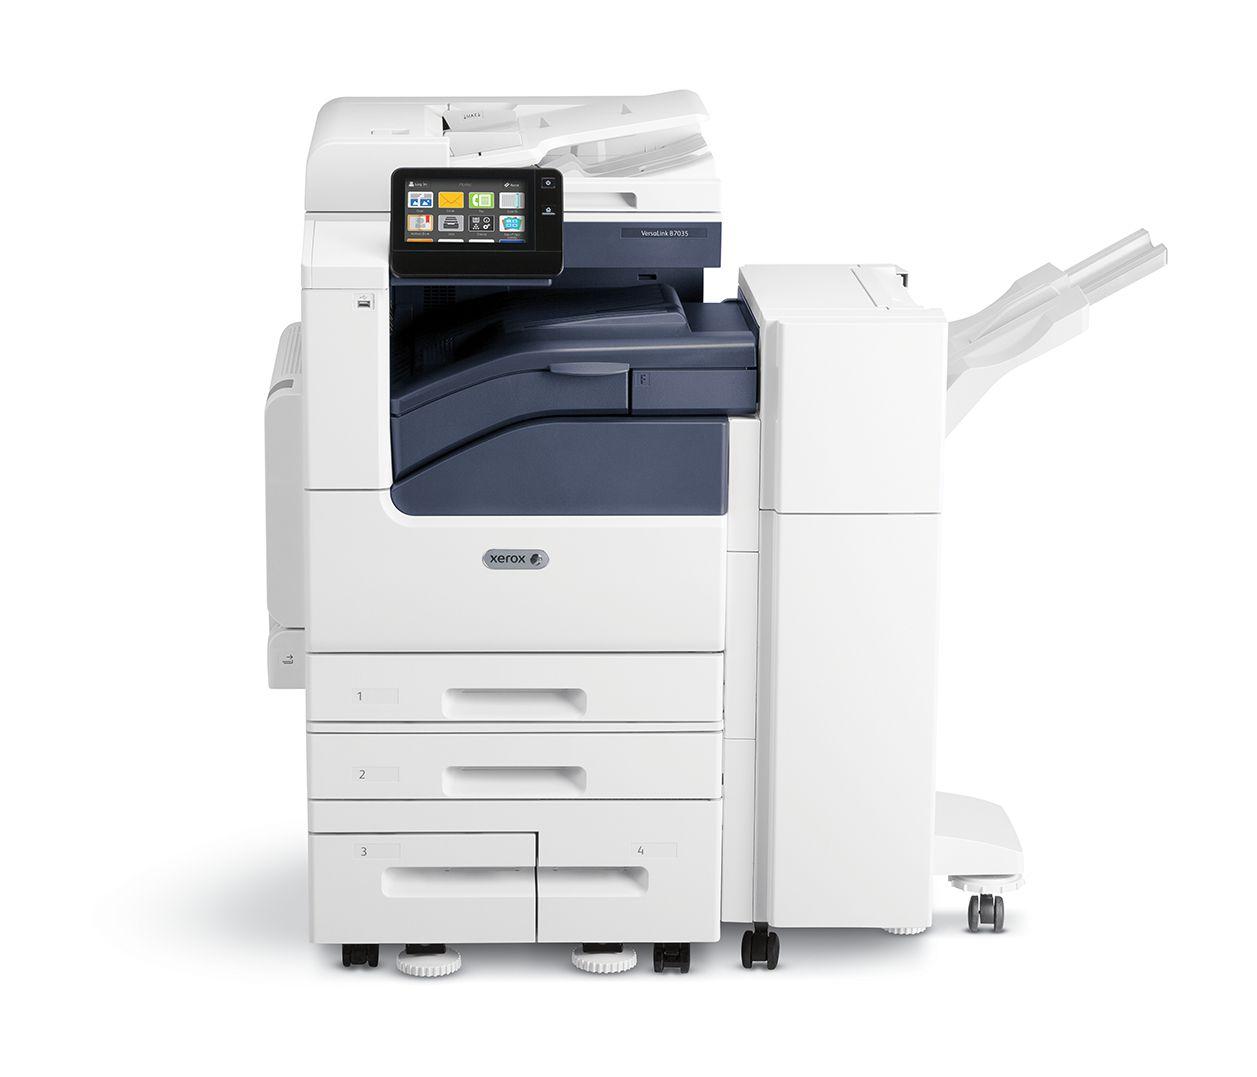 МФУ Xerox VersaLink B7030 (VLB7030CPS_T)